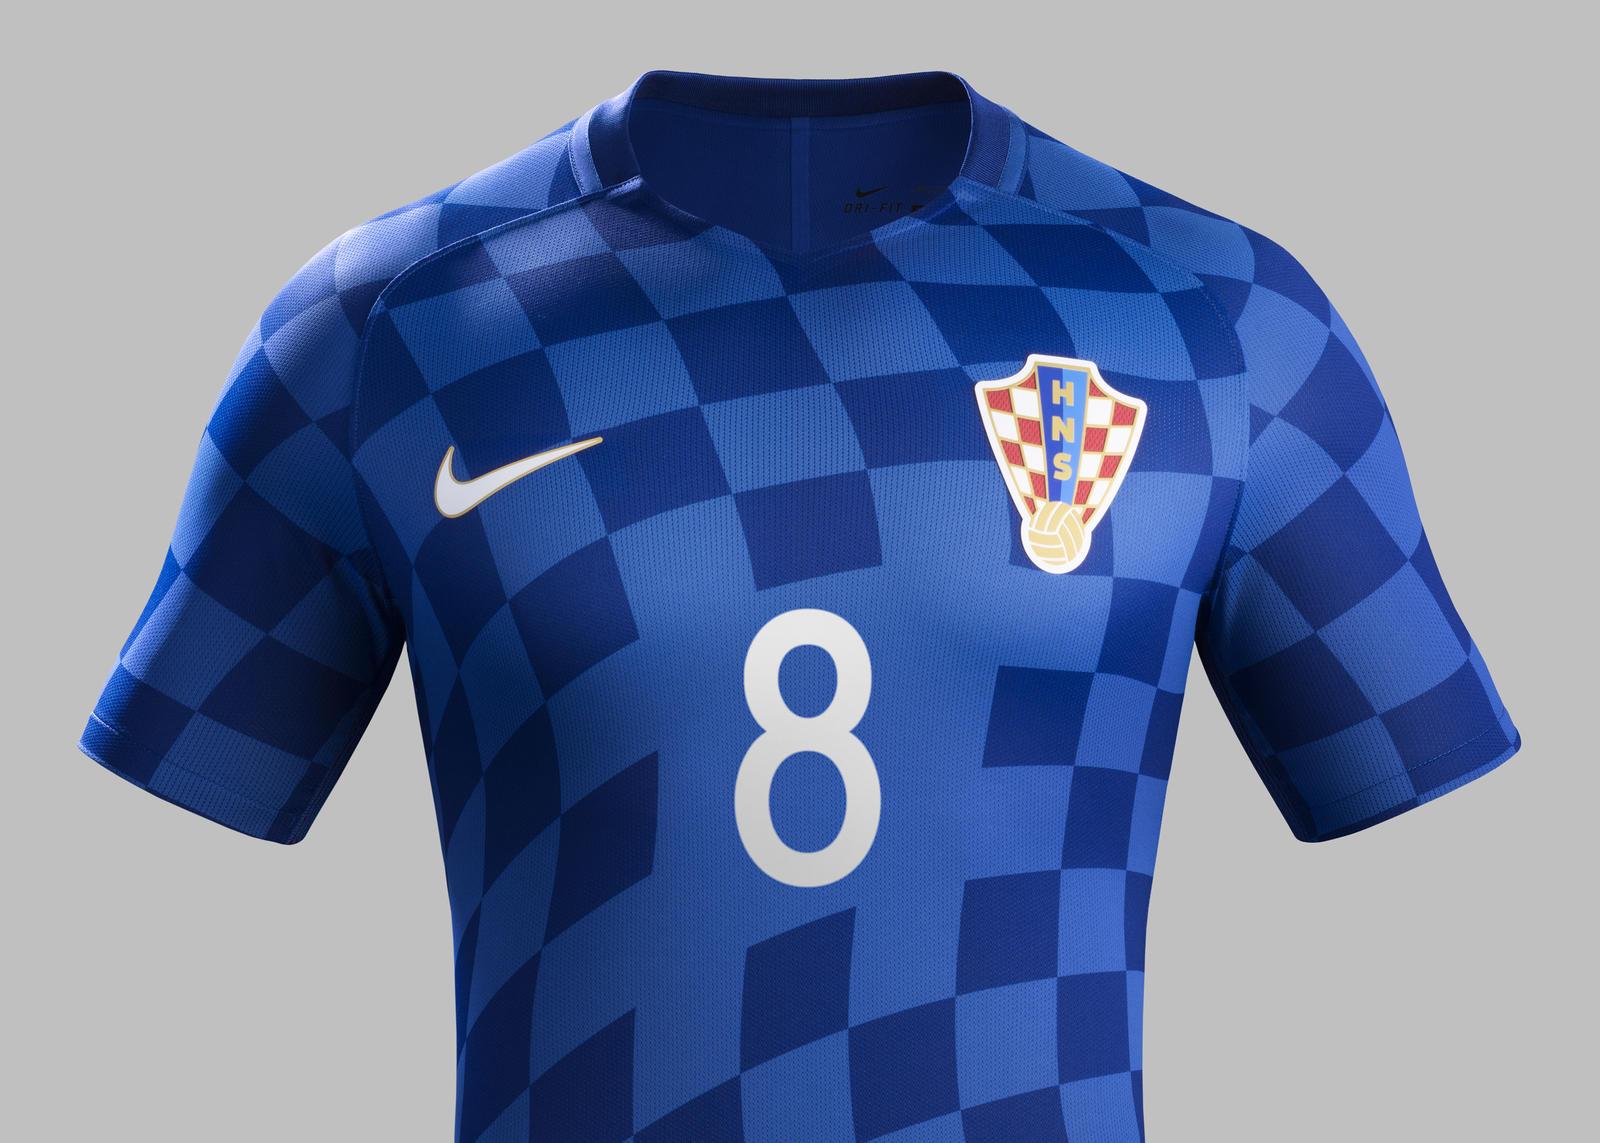 7d78aaf7dcc Croatia 2016 National Football Kits - Nike News